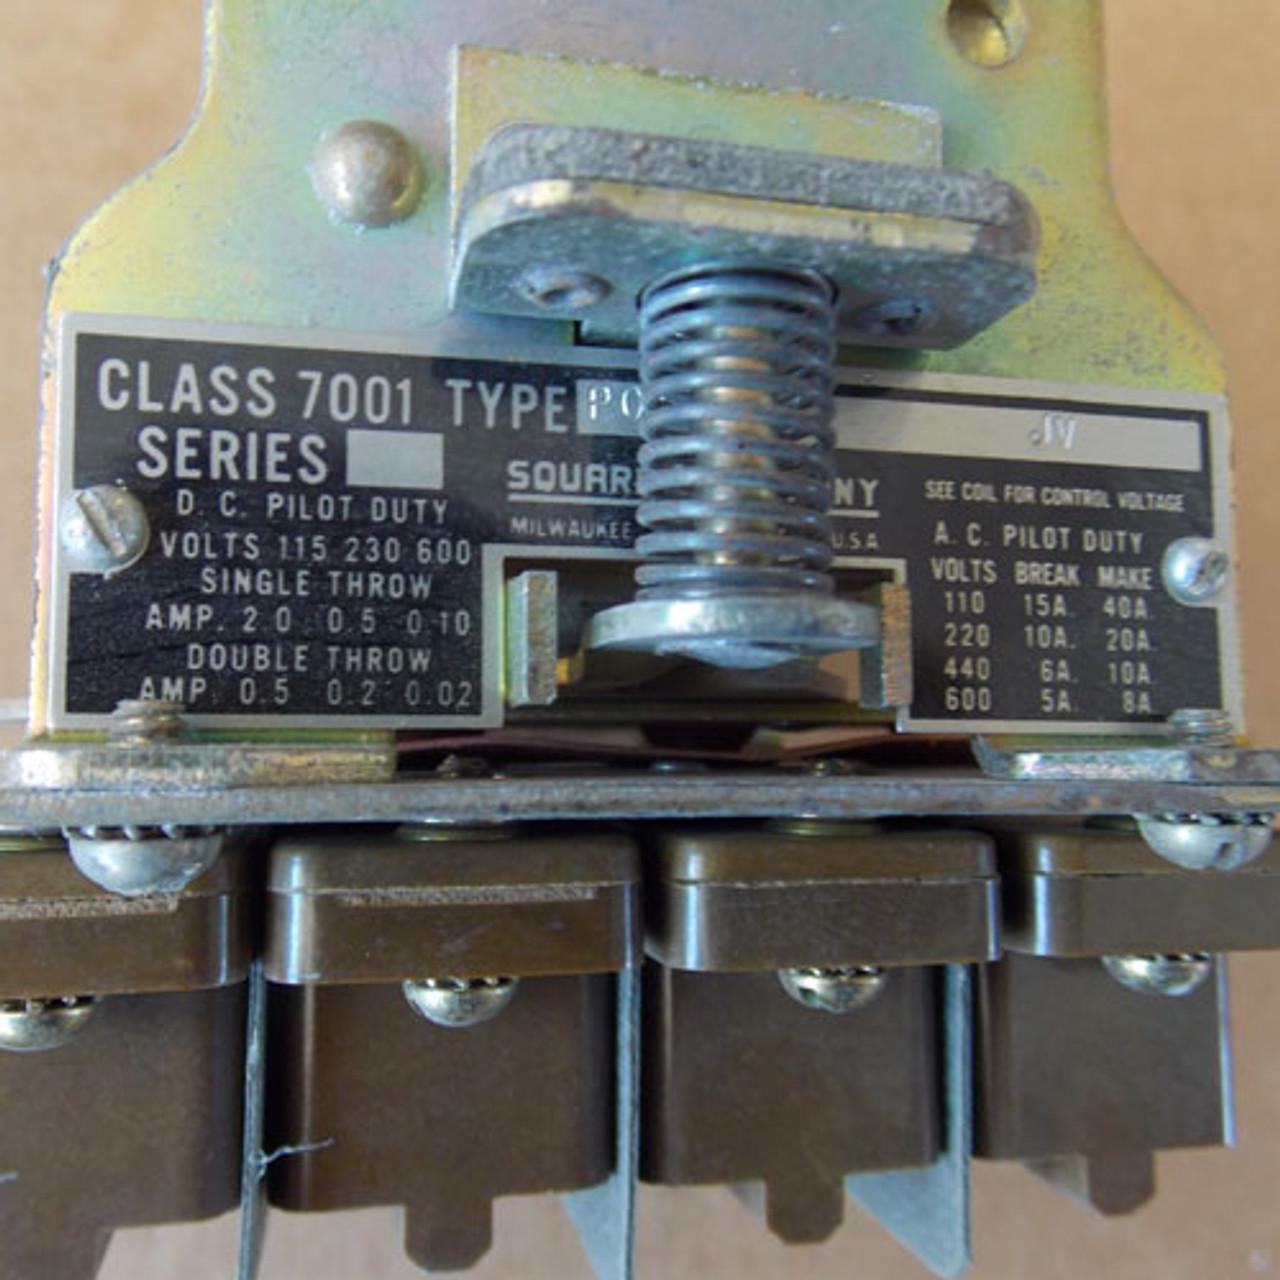 Square D Type 7001 PO-4 JV Magnetic Relay 24VDC Coil - Used